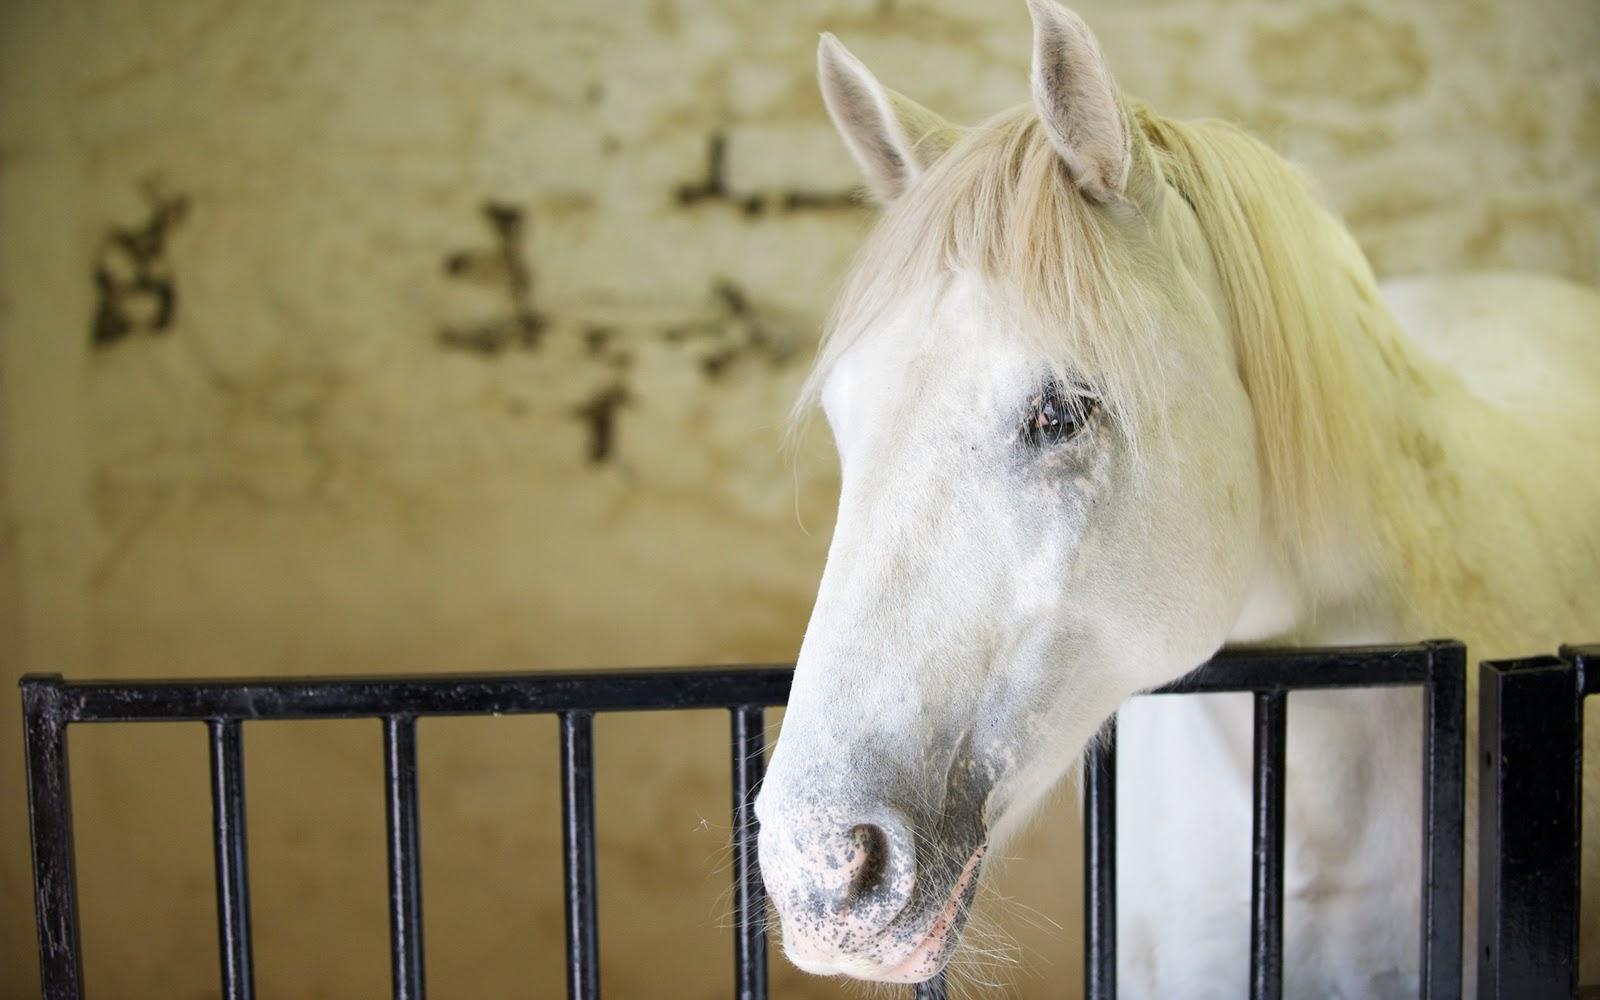 horse wallpapers wild horses photos | animal photo